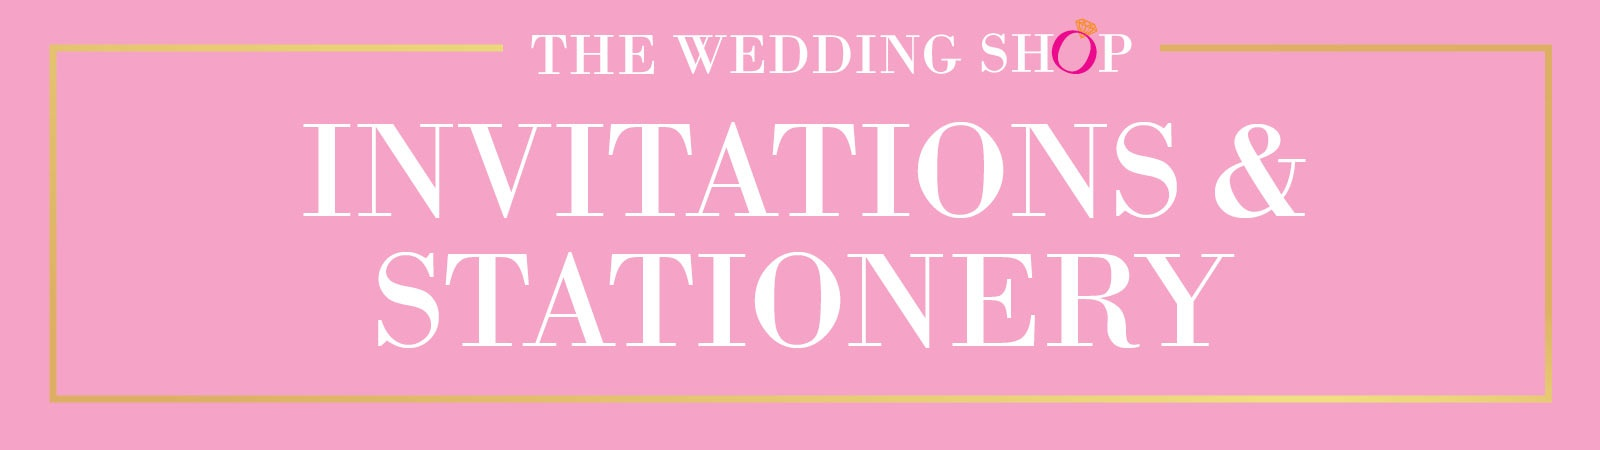 Invitations, stationery, custom invitations, custom stationery ...